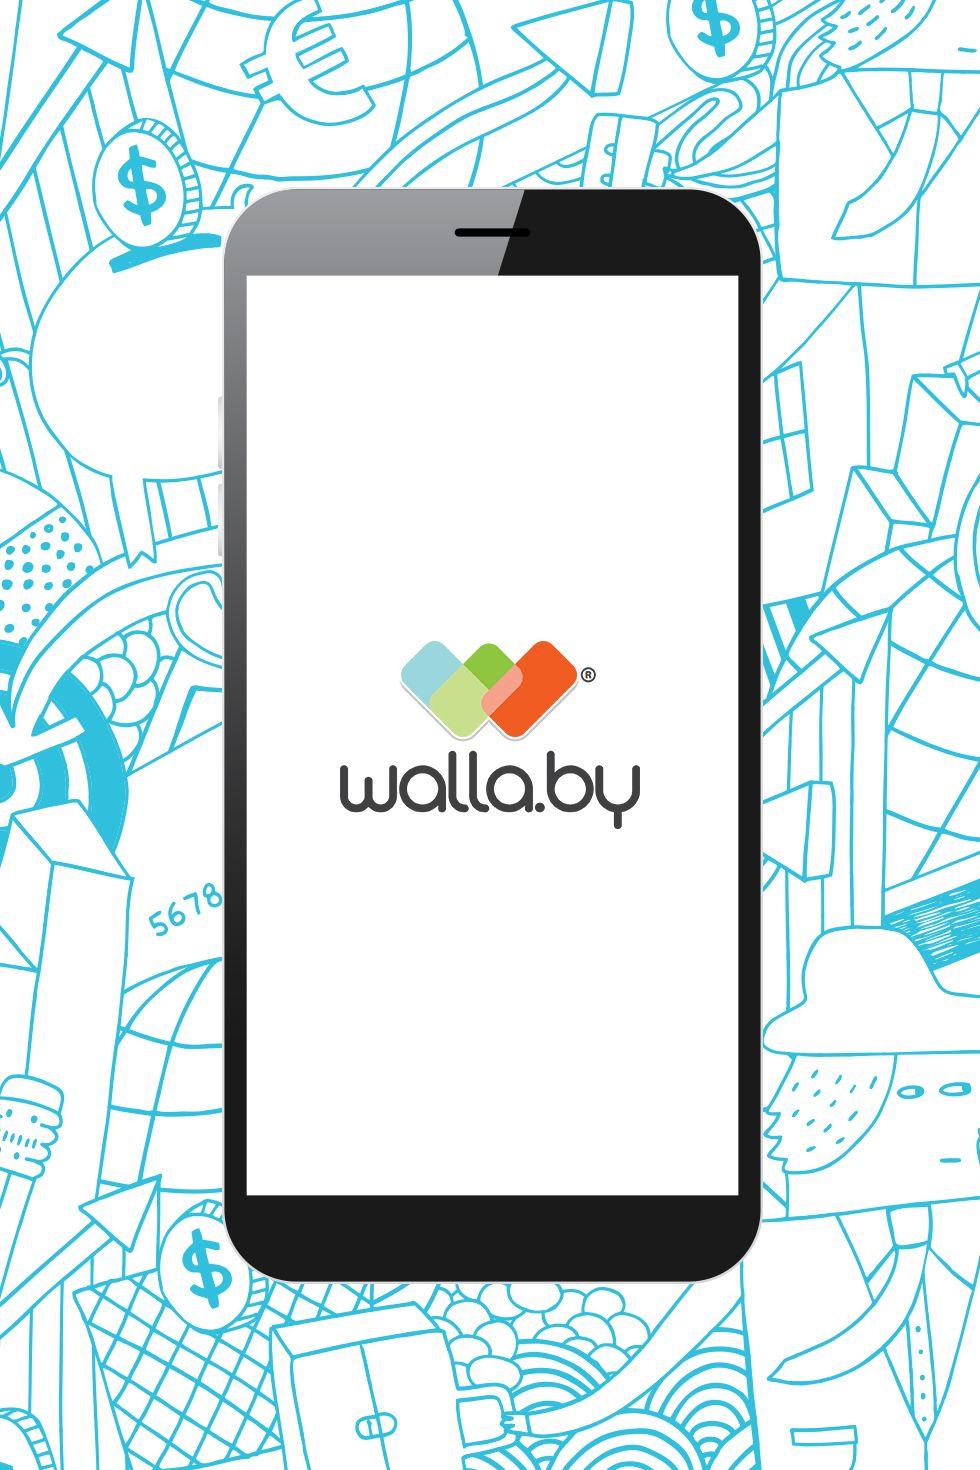 wallaby money-saving app